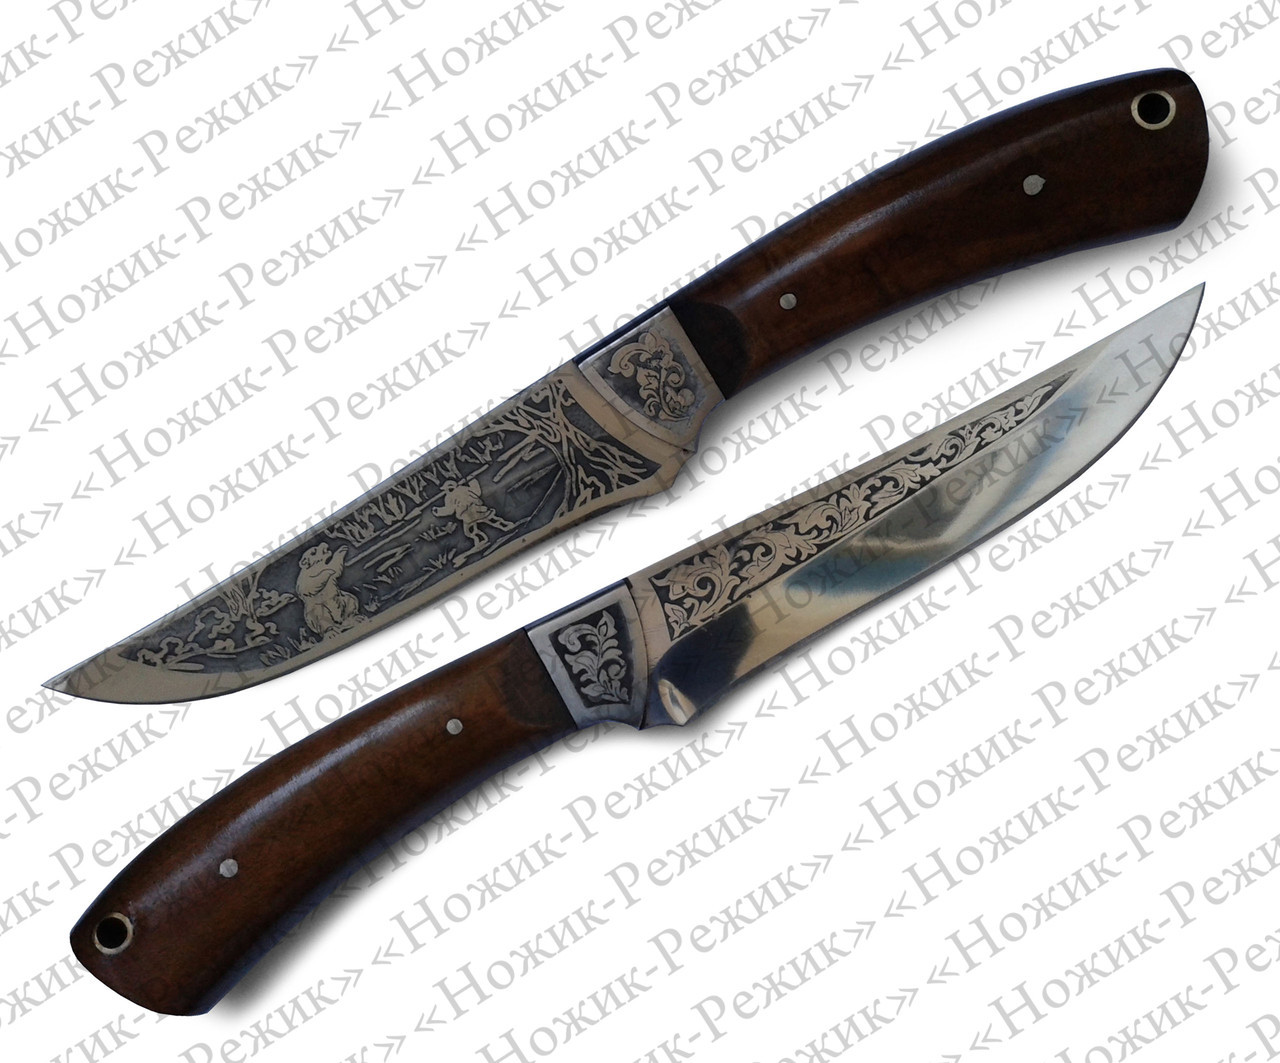 Нож от производителя, туристические ножи, нож, боевой нож, армейский нож, охотничьи ножи